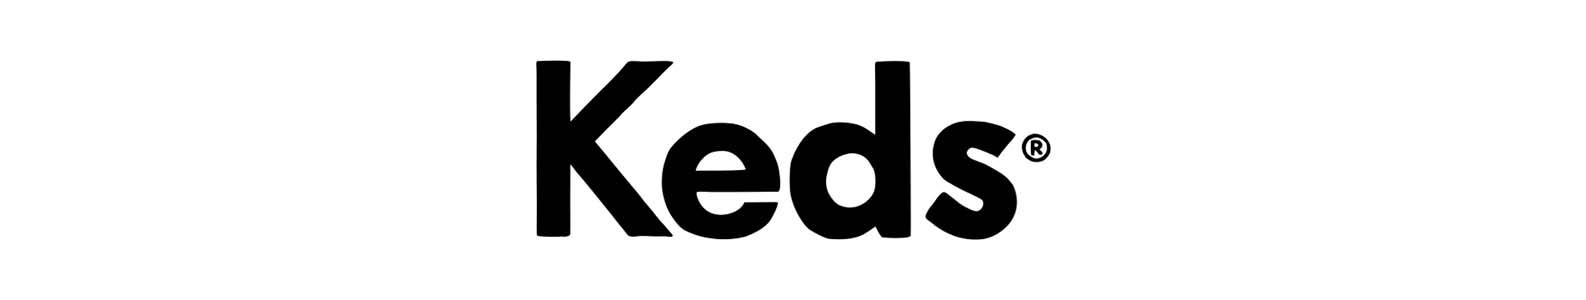 Keds brand header image